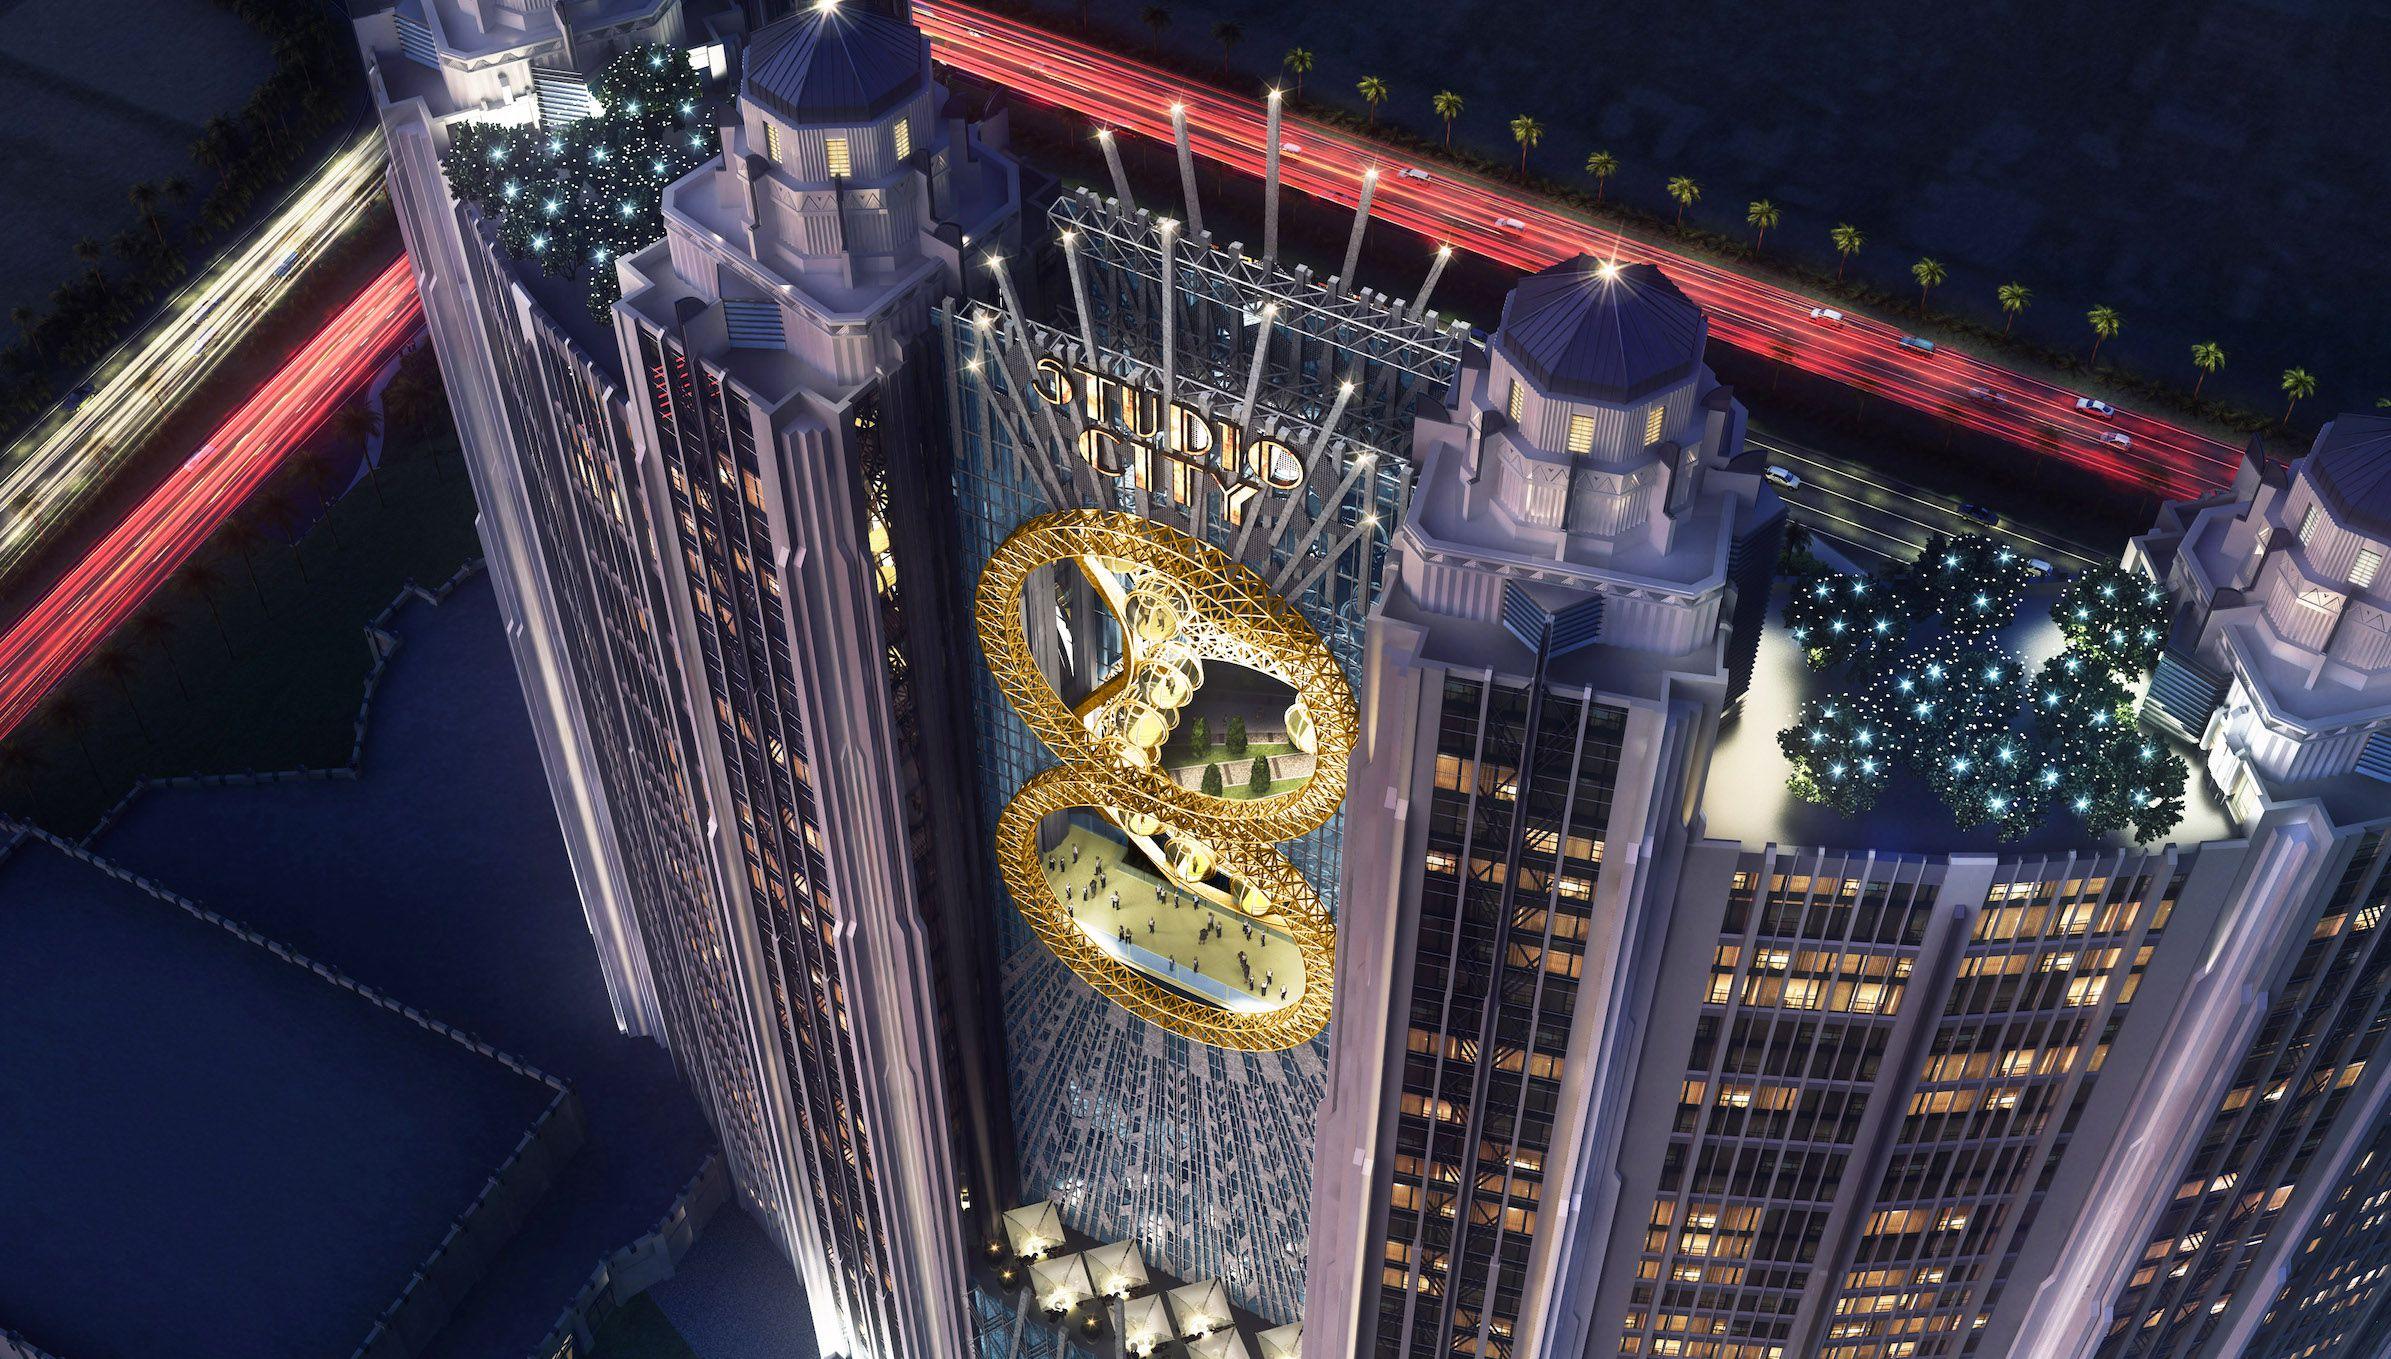 Figure-8 Ferris Wheel in Macau China